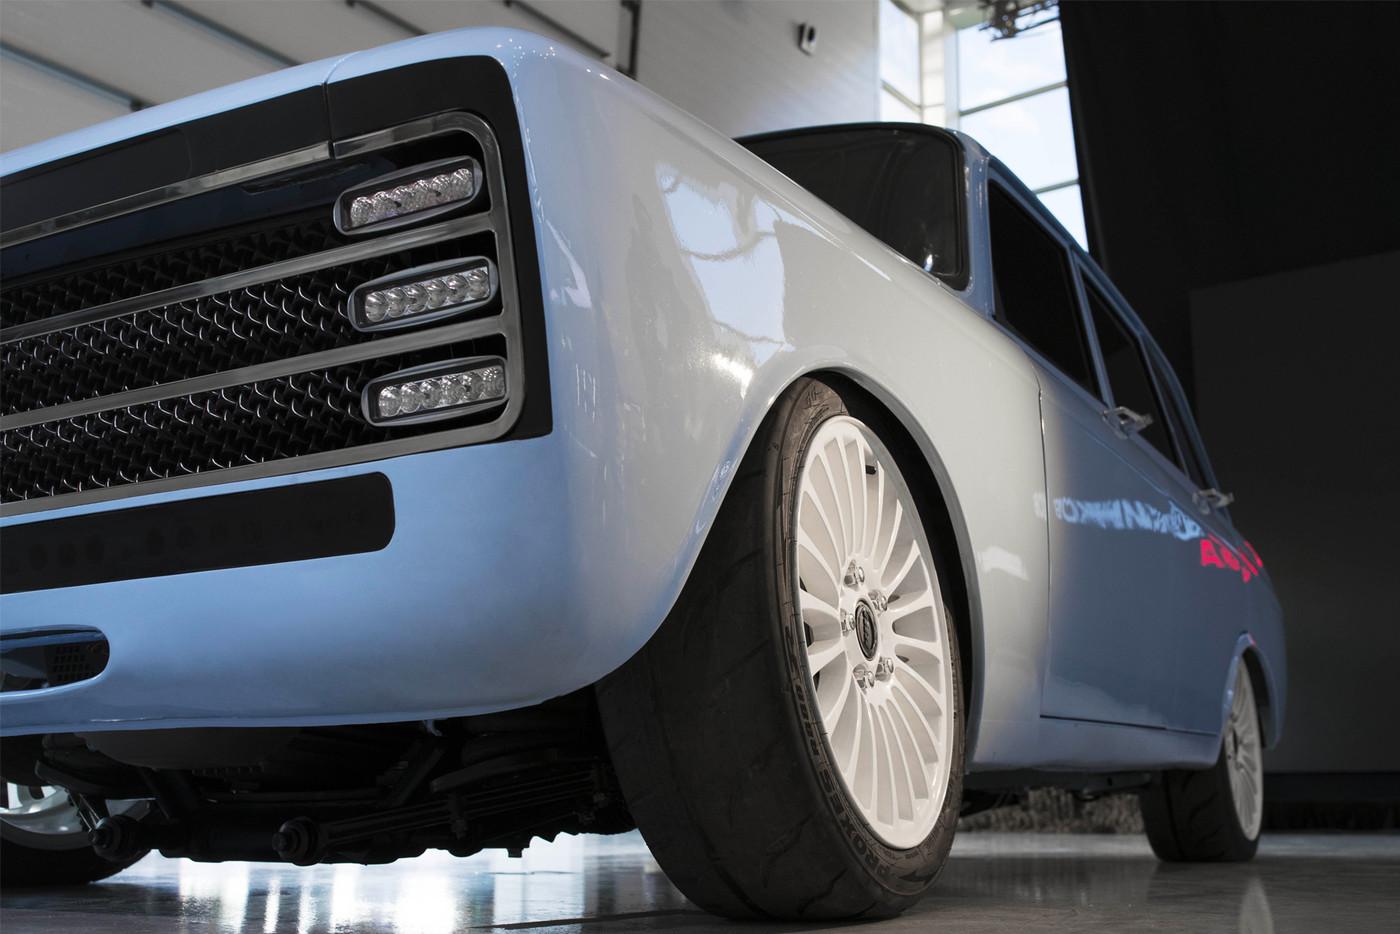 https_hypebeast.comimage201808kalashnikov-electric-supercar-cv-1-prototype-izh-2125-kombi-003